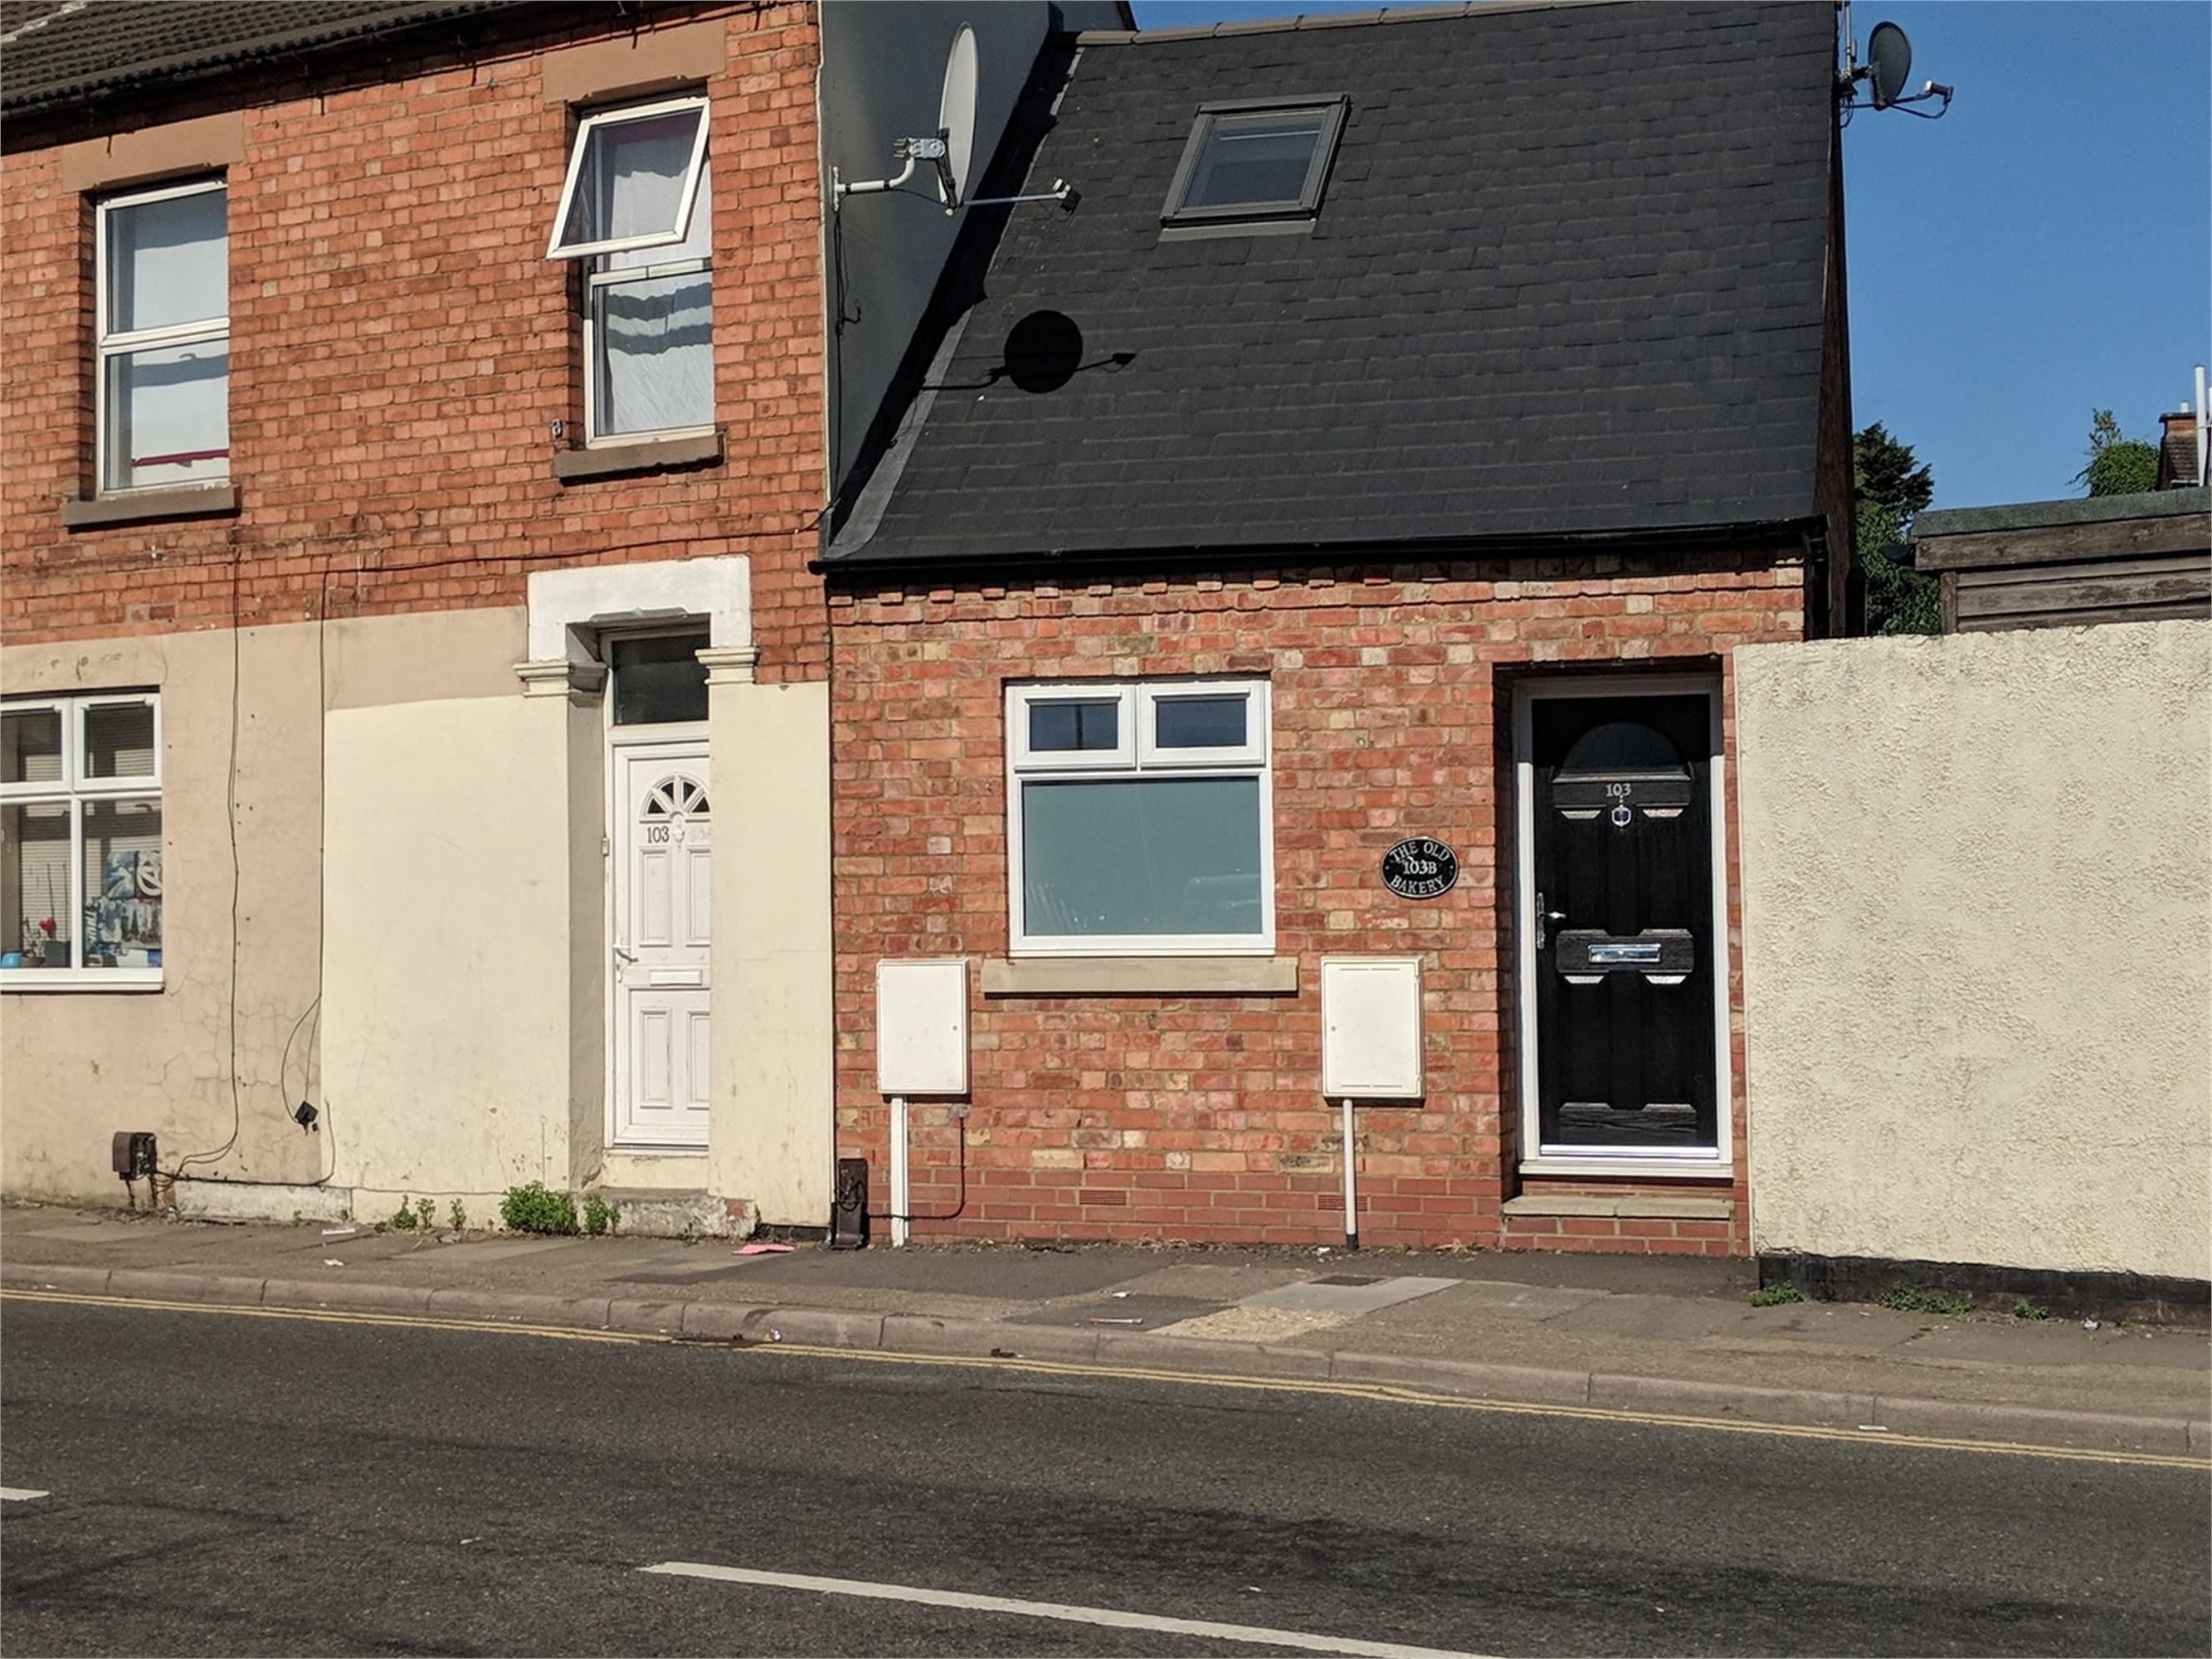 St Andrews Road, Northampton Image